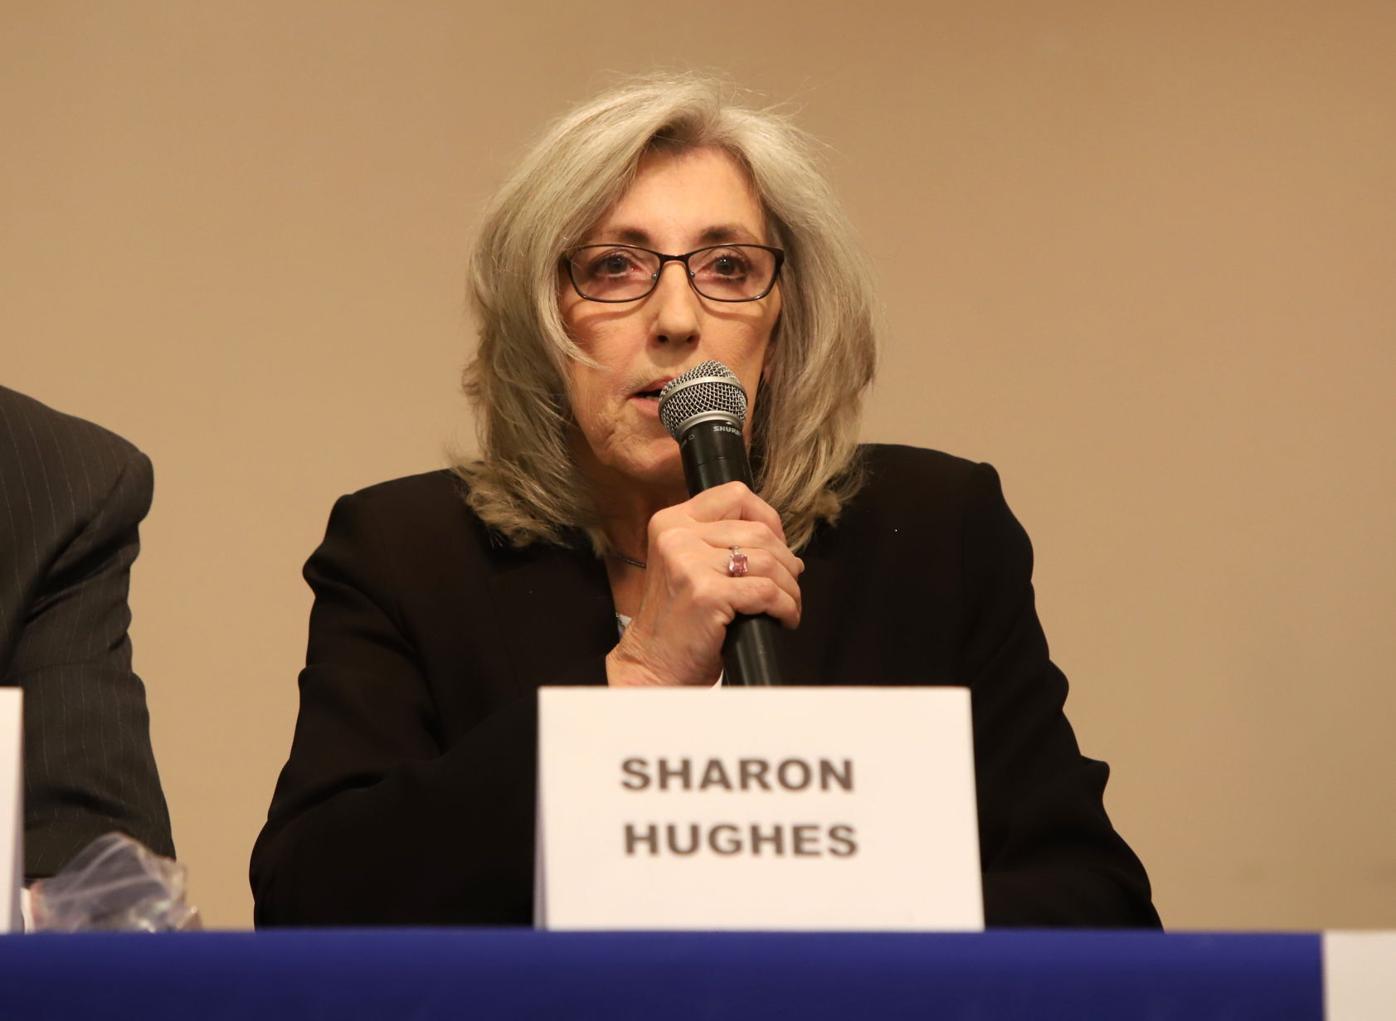 Remembering Sharon Hughes